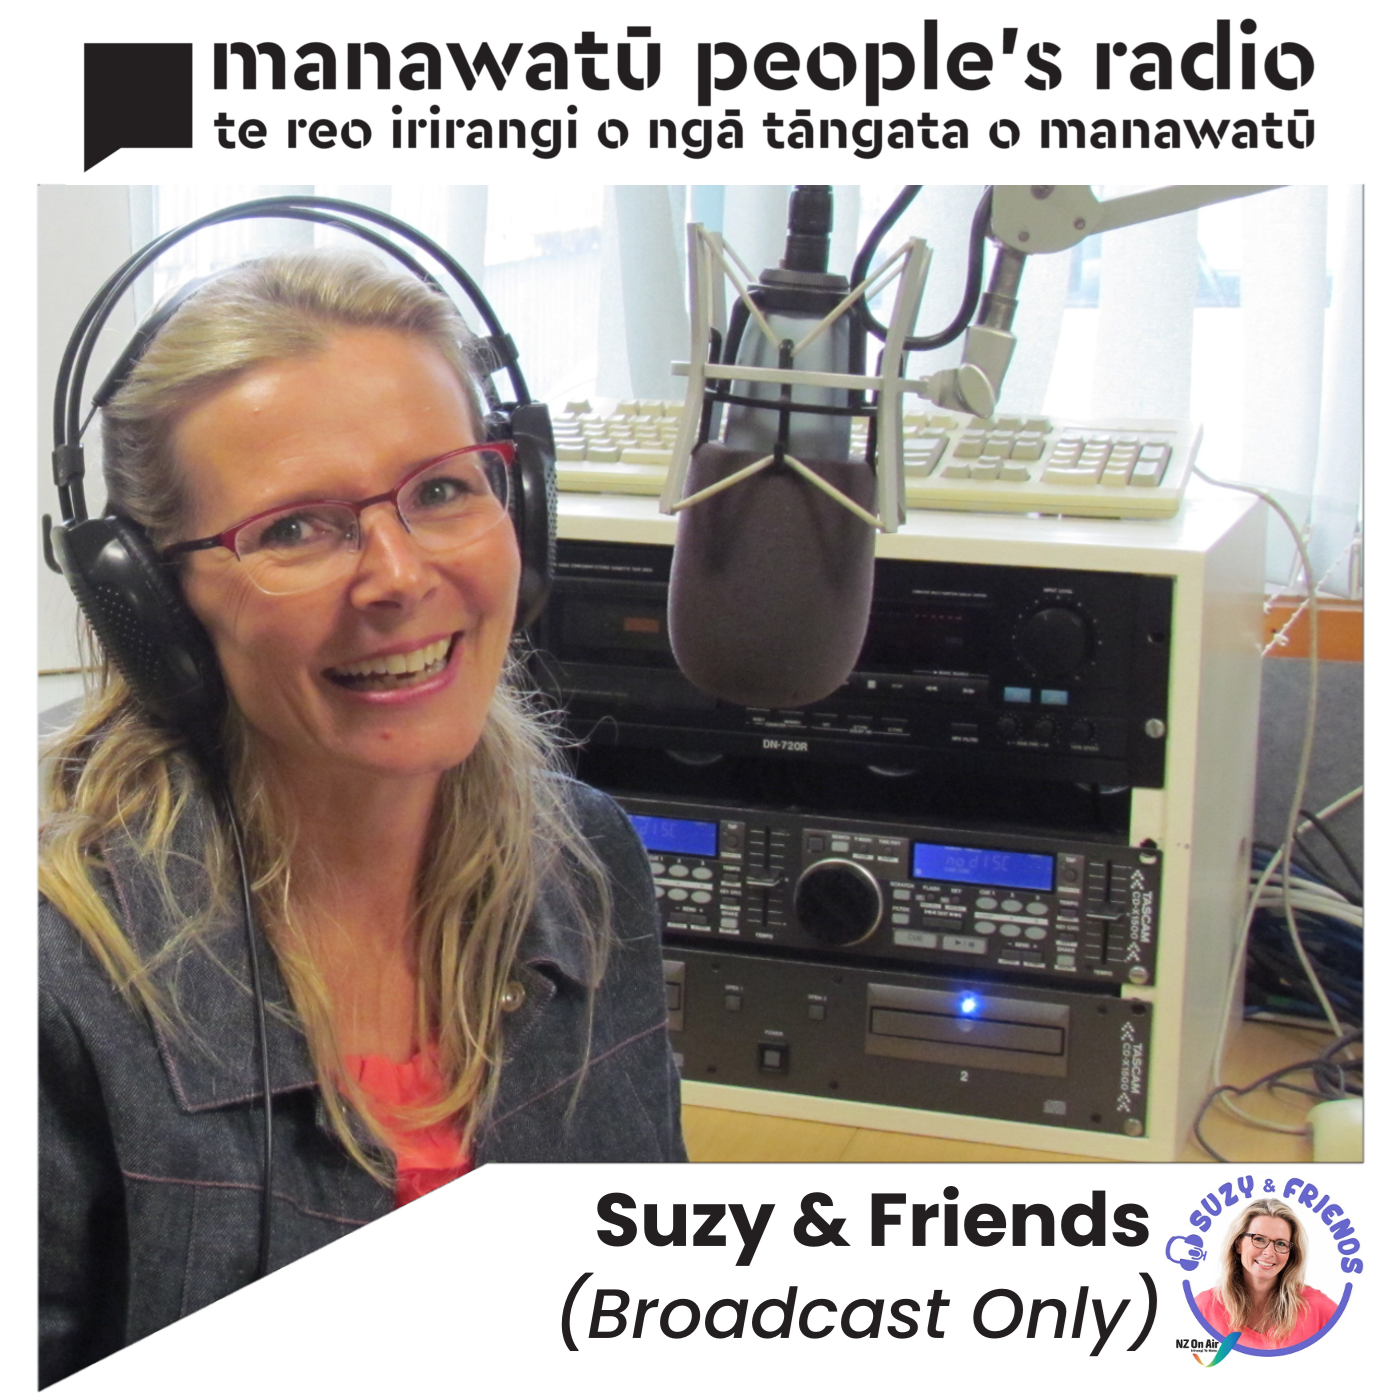 https://static.accessradio.org/StationFolder/manawatu/Images/MPR - SuzyAndFriends.png